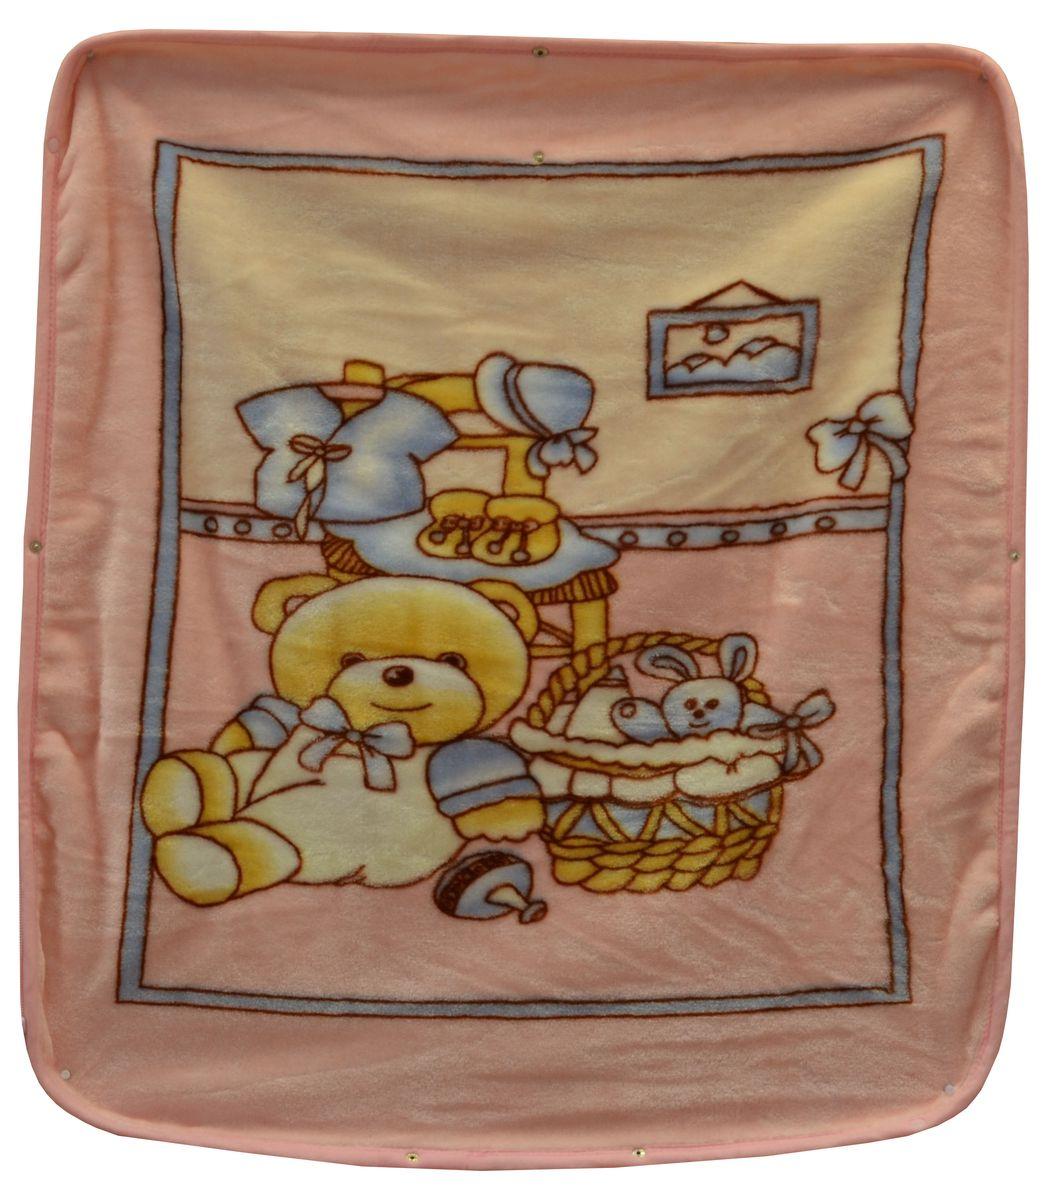 лучшая цена Bonne Fee Плед-накидка для младенцев на молнии 2, 80 х 90 см, цвет: розовый